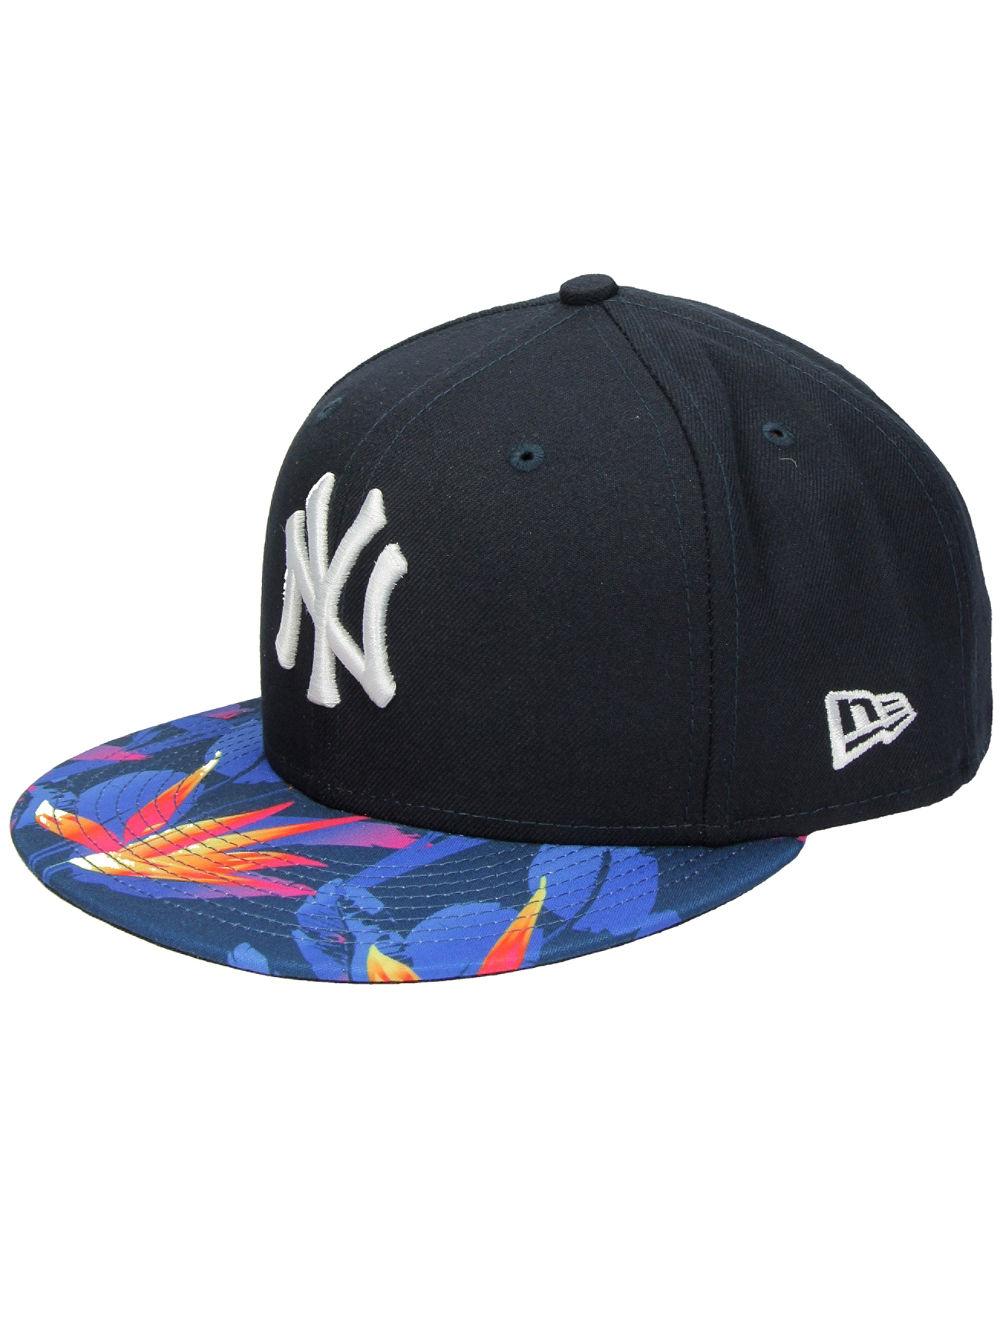 210a89baba8 Buy New Era NY Yankees Birds Of Paradise Cap online at Blue Tomato